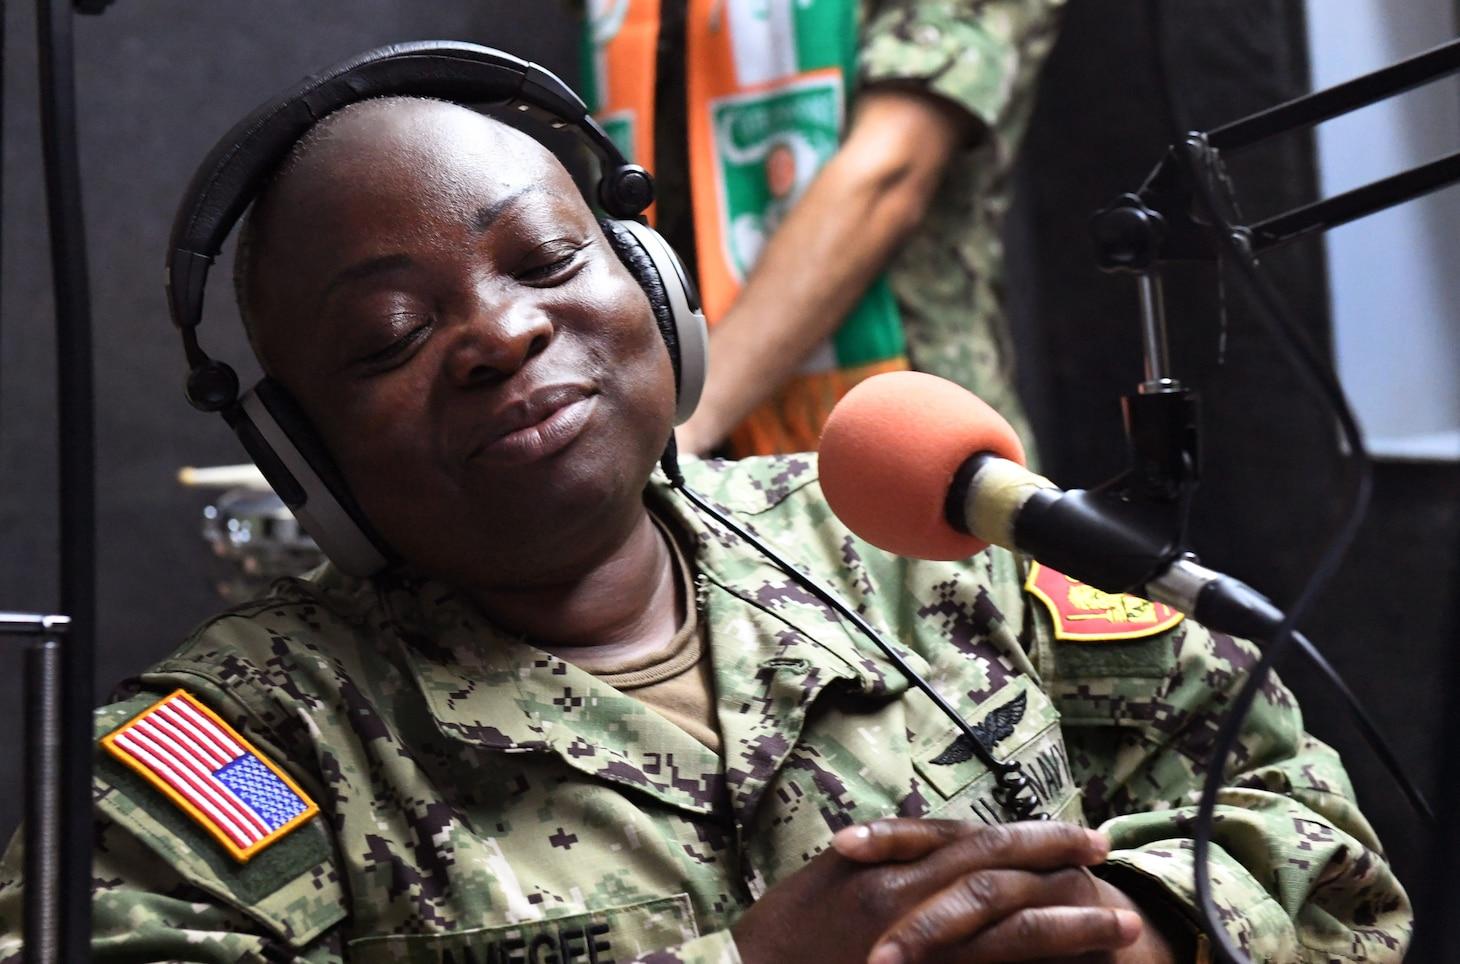 Lt. Lynda Amegee